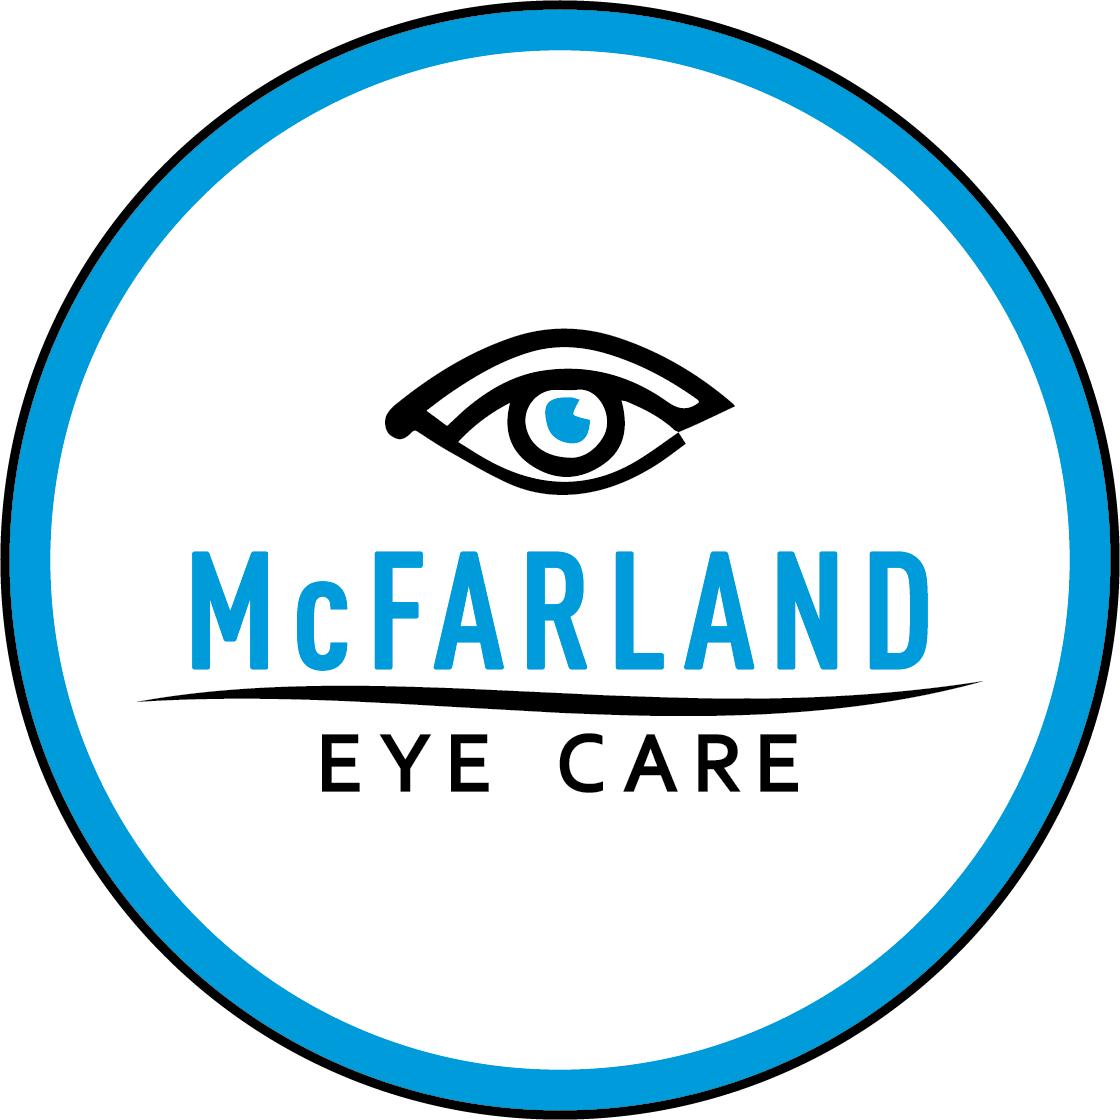 McFarland Eye Care, , Eye Care Specialist